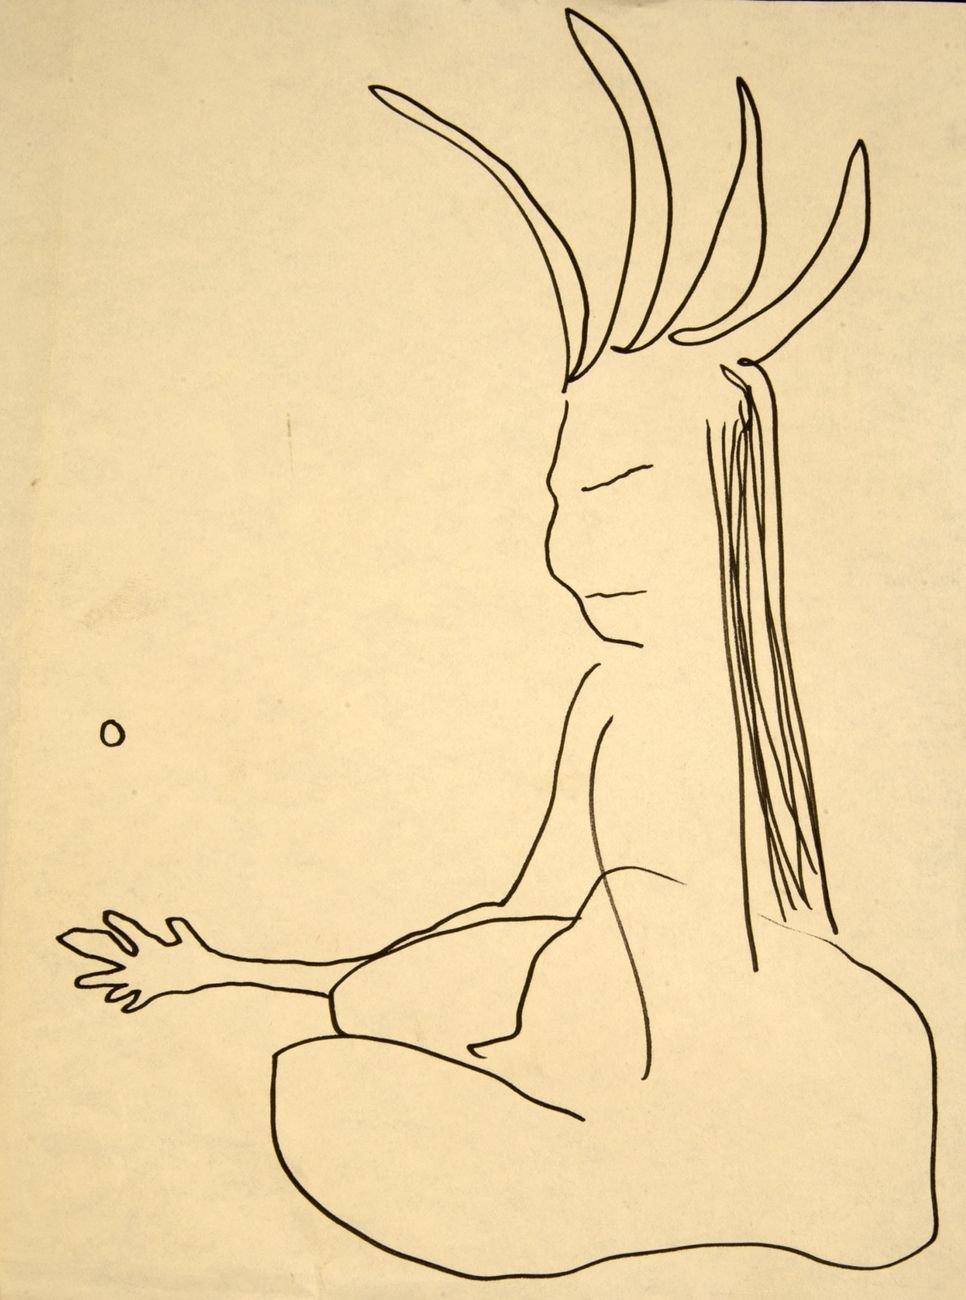 Jack Kerouac, Sacred Heart, N.D., olio su carta. 23x30,5 cm